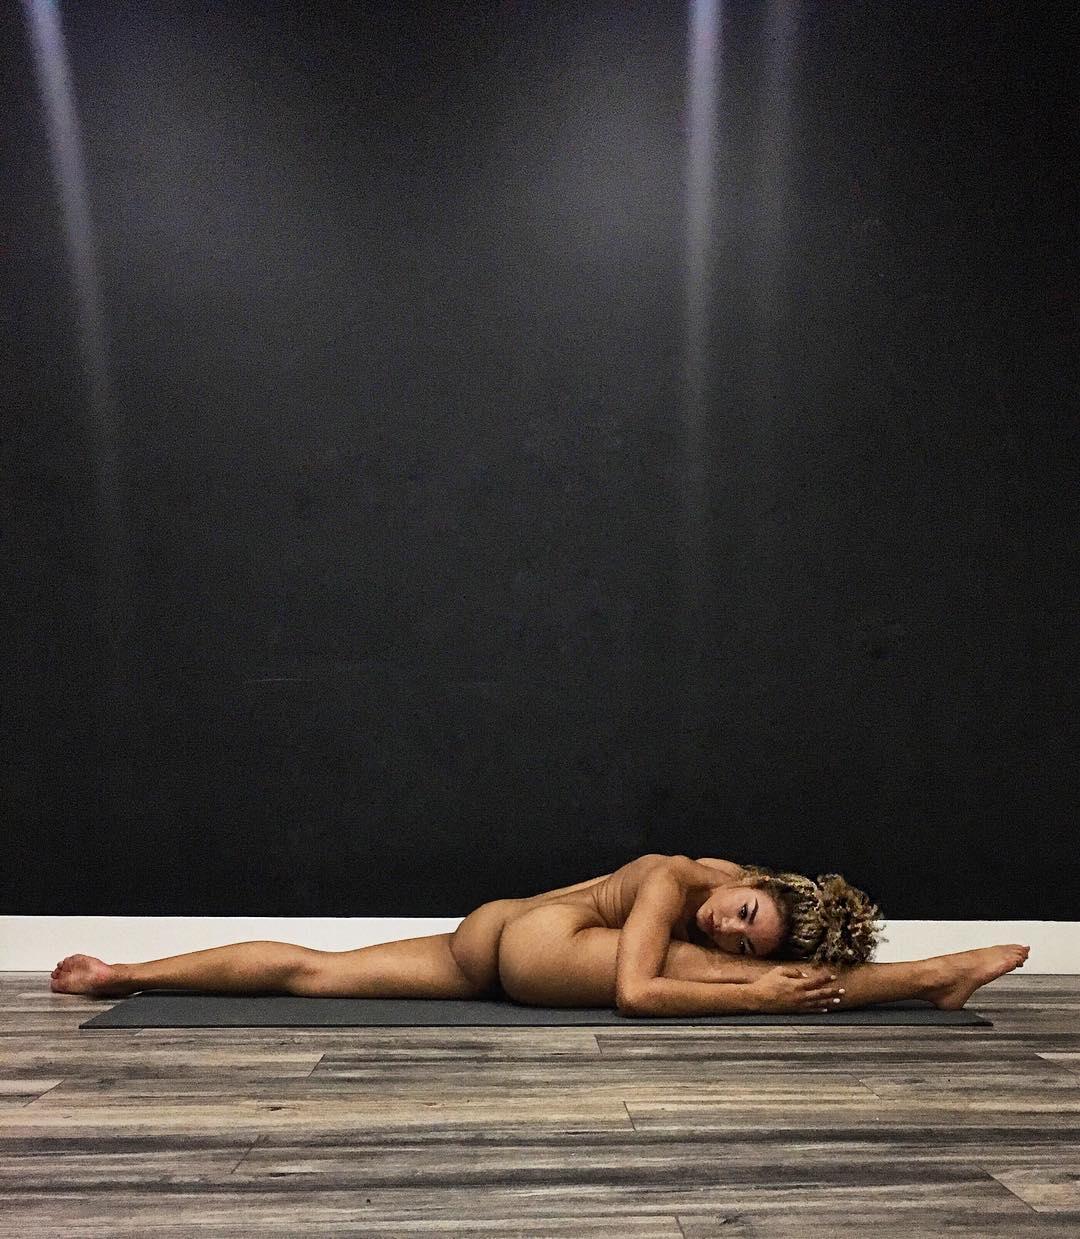 jess-taras-nude-yoga.jpg